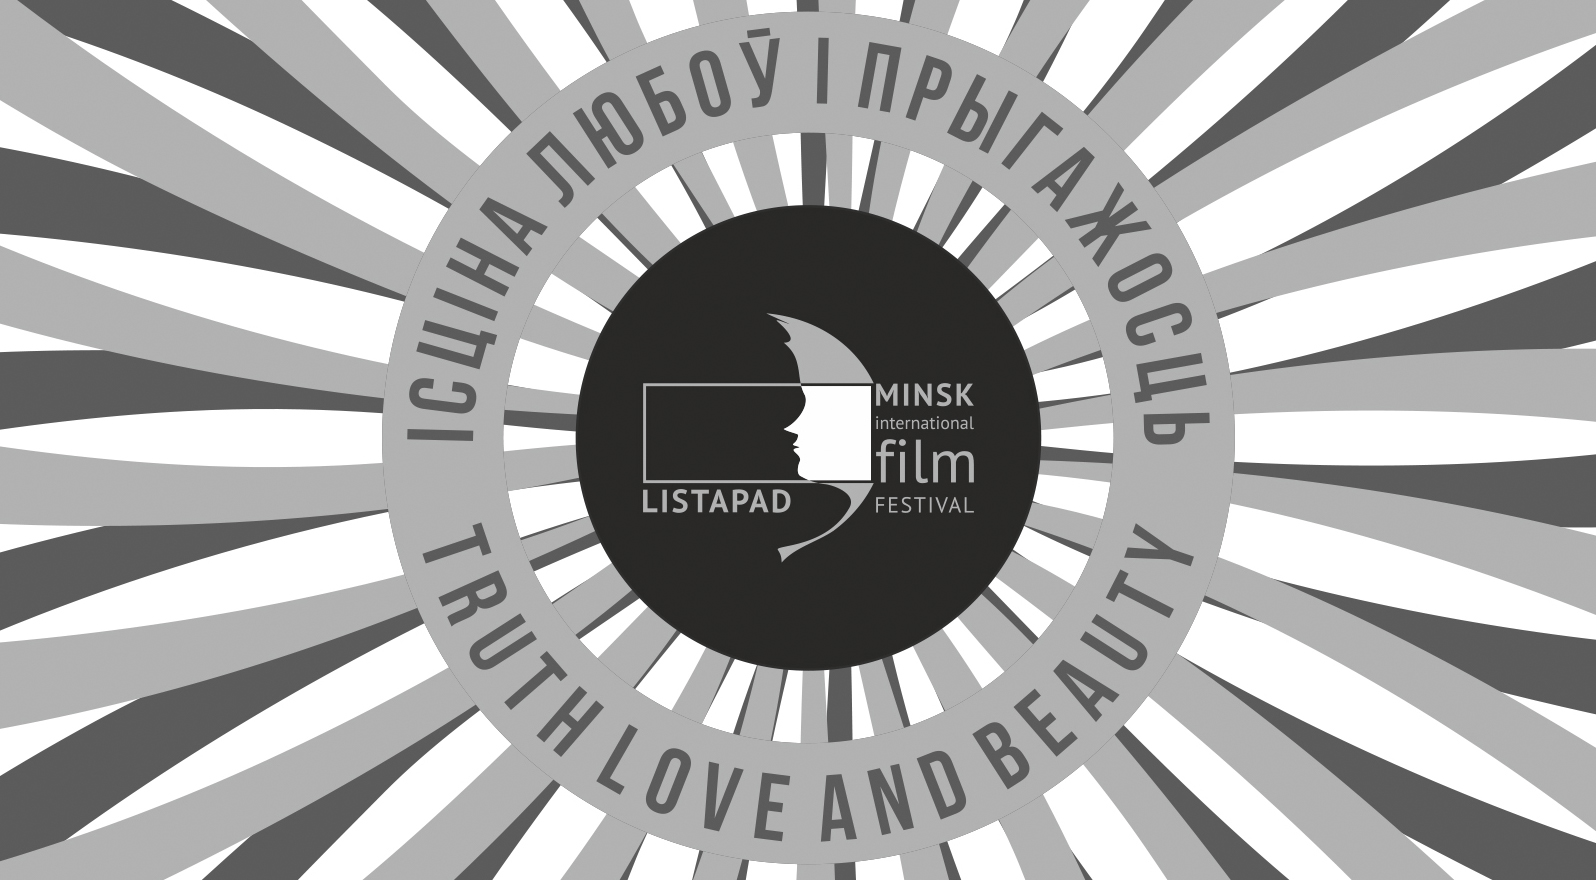 Фестиваль «Листапад-2017» обзавёлся слоганом